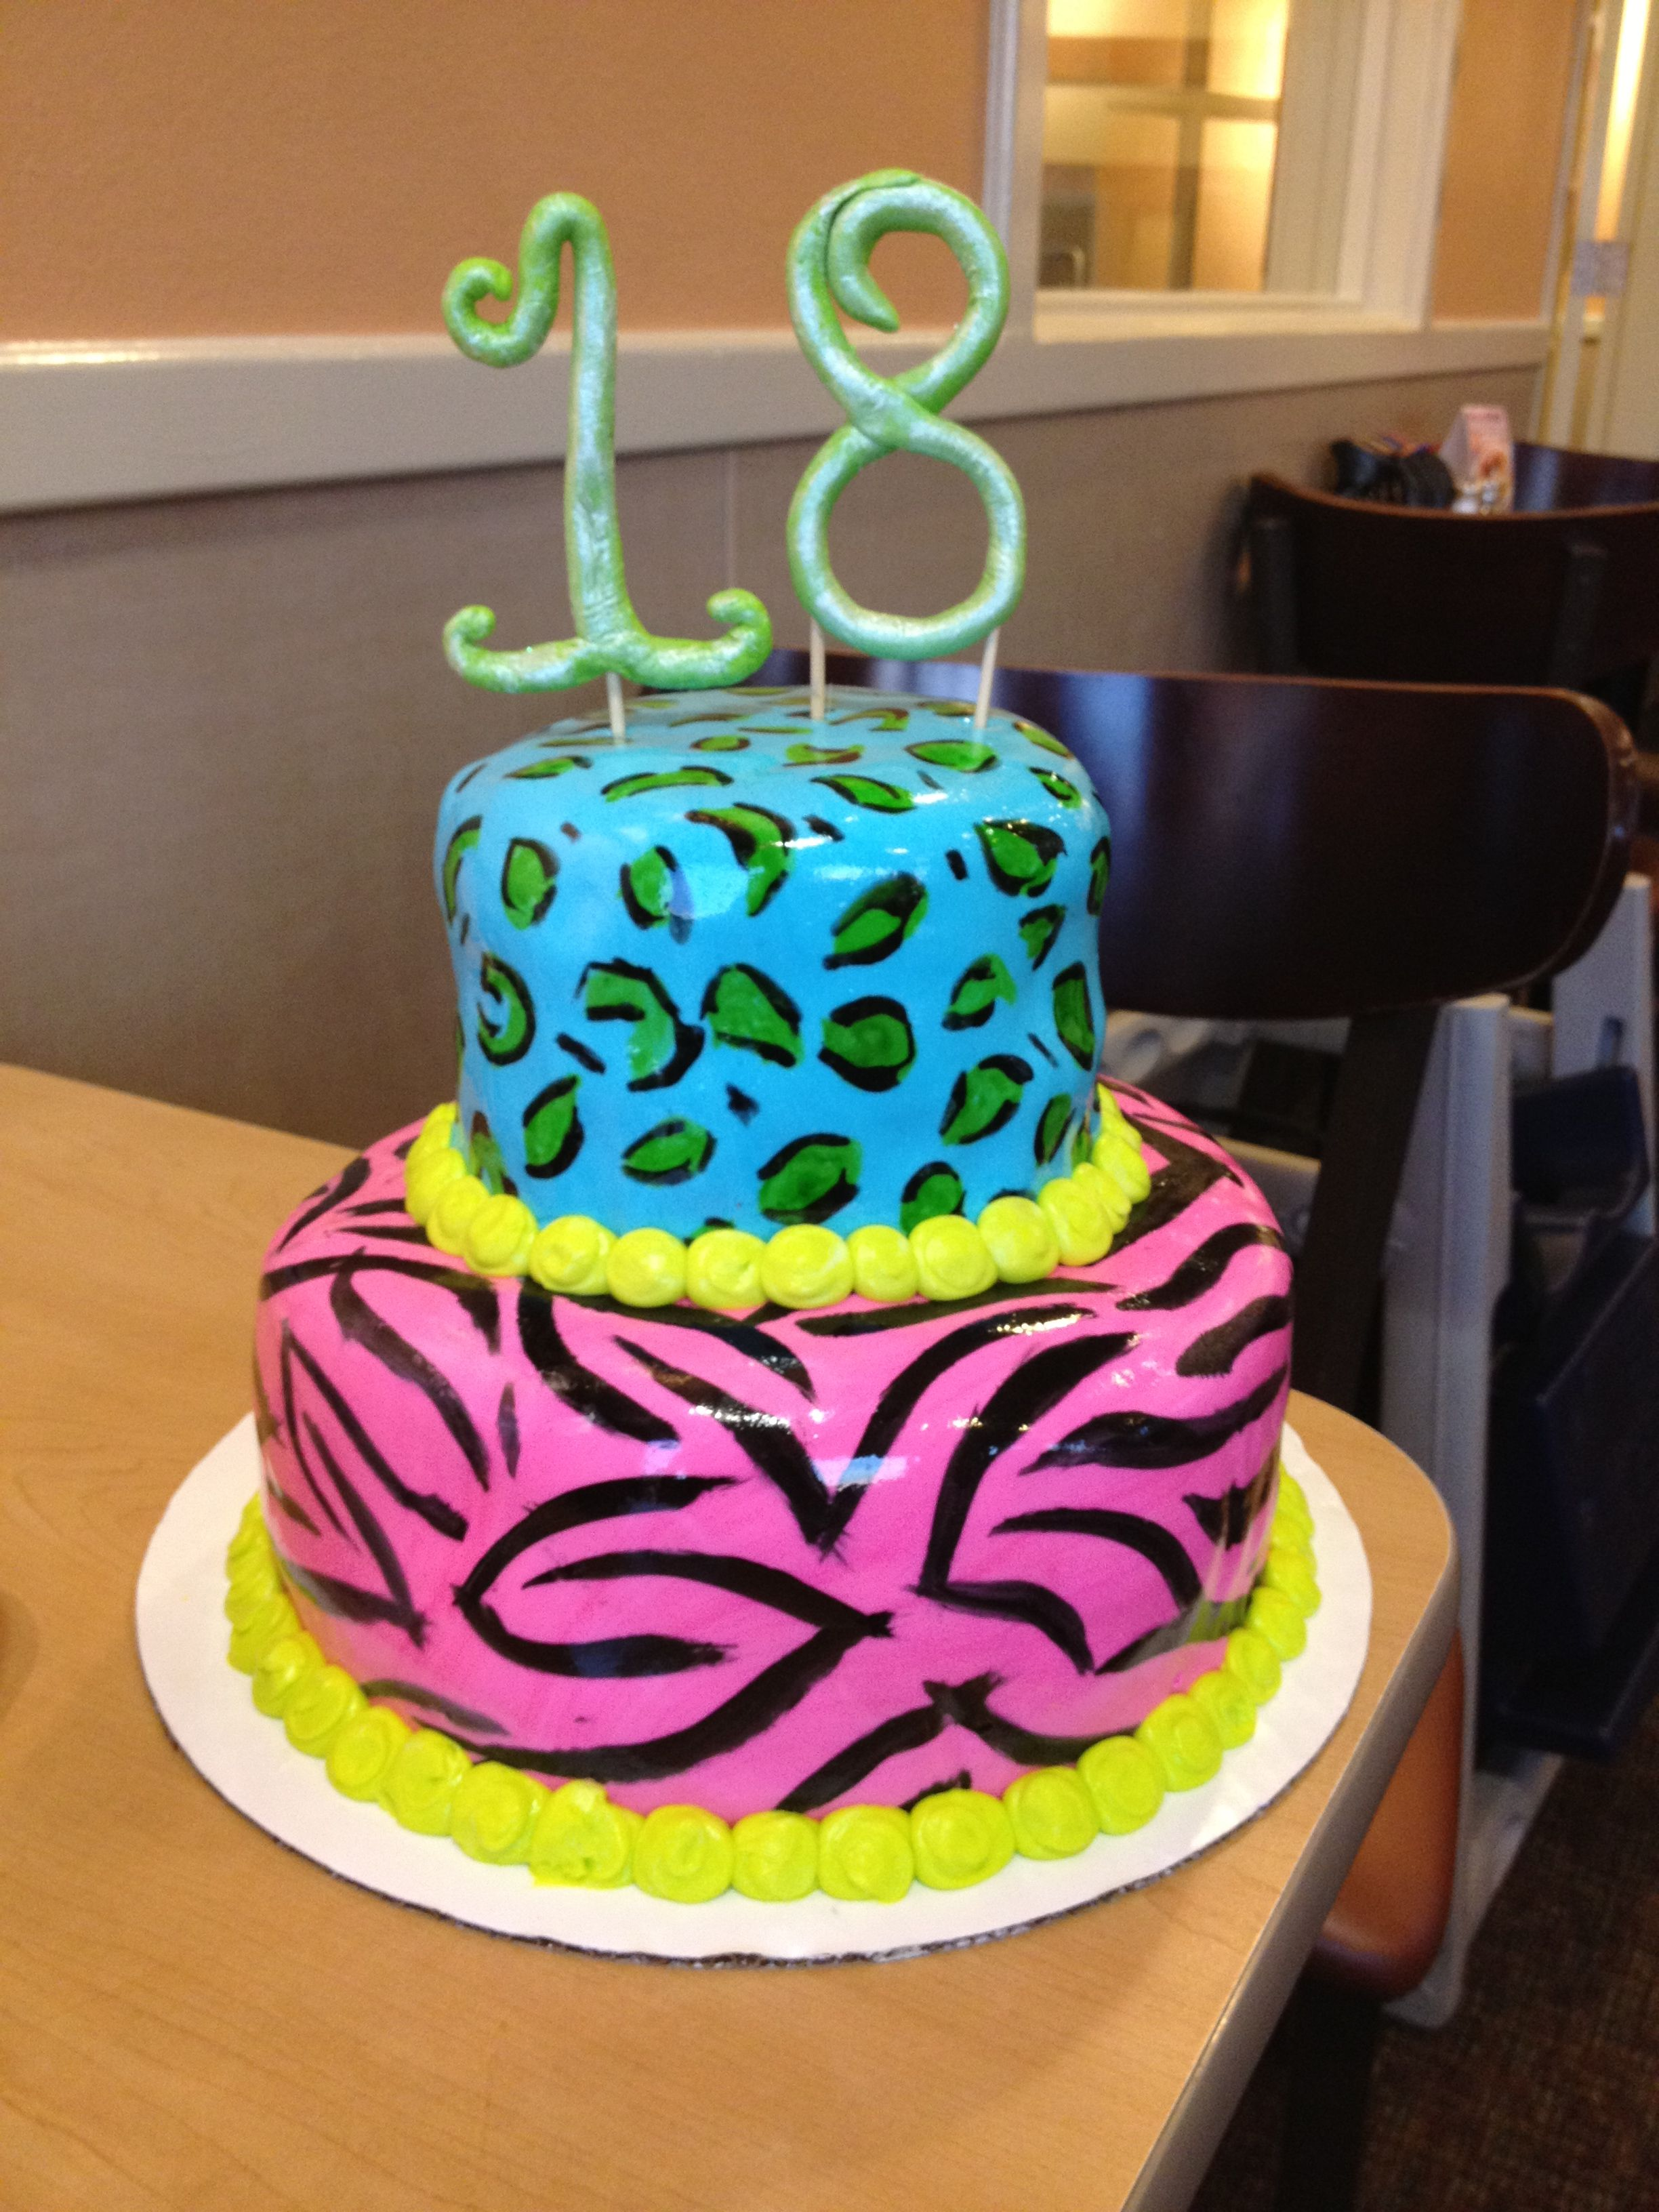 18th birthday cake   18th birthday party, 18th birthday ...